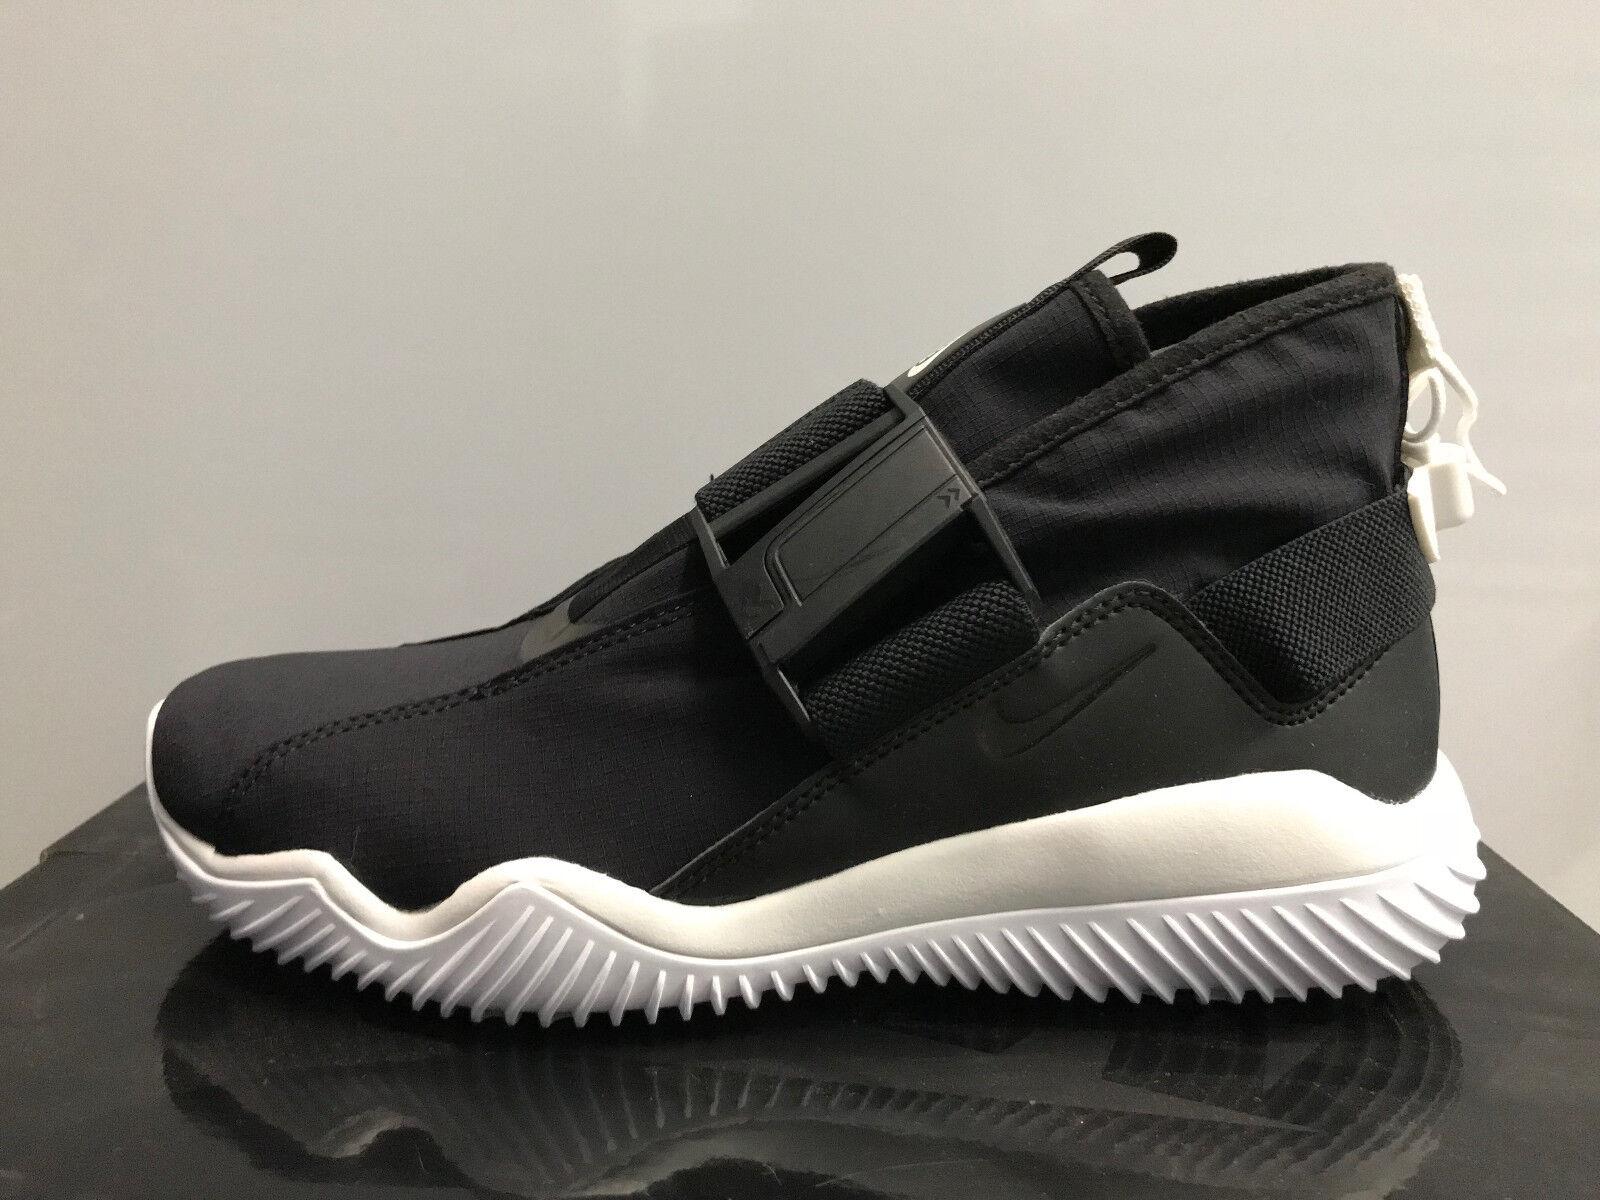 Nike KMTR Komyuter PRM Black White 921664-001 6.5-13 lab nikelab acg air